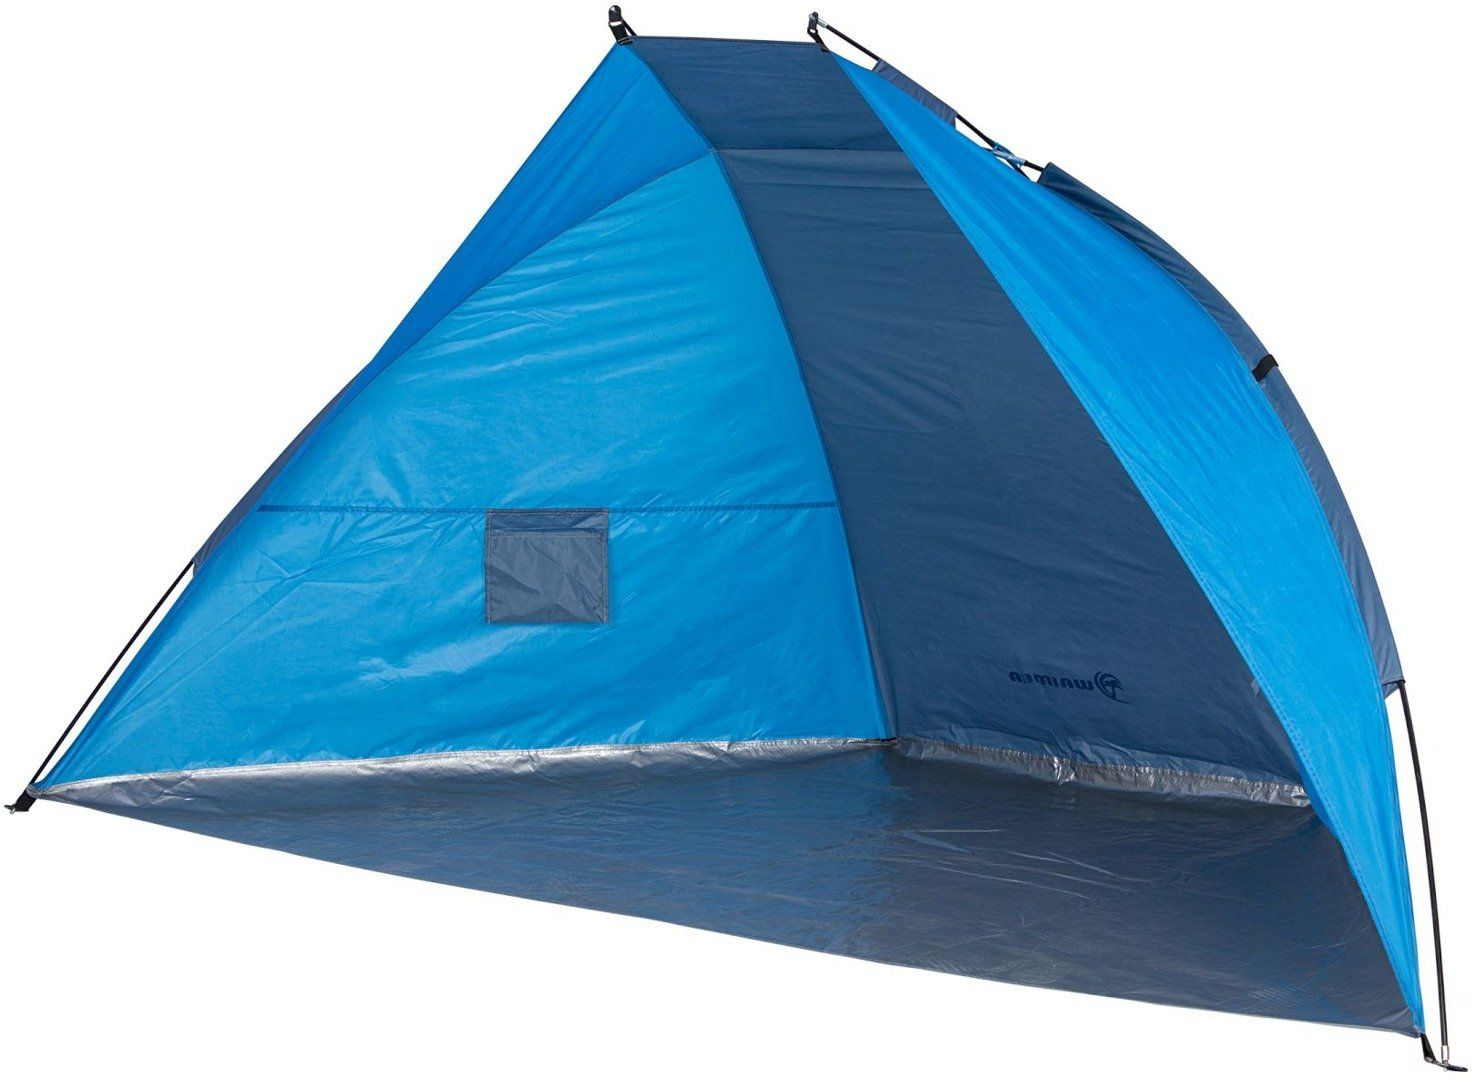 Namiot plażowy parawan Bastion Waimea